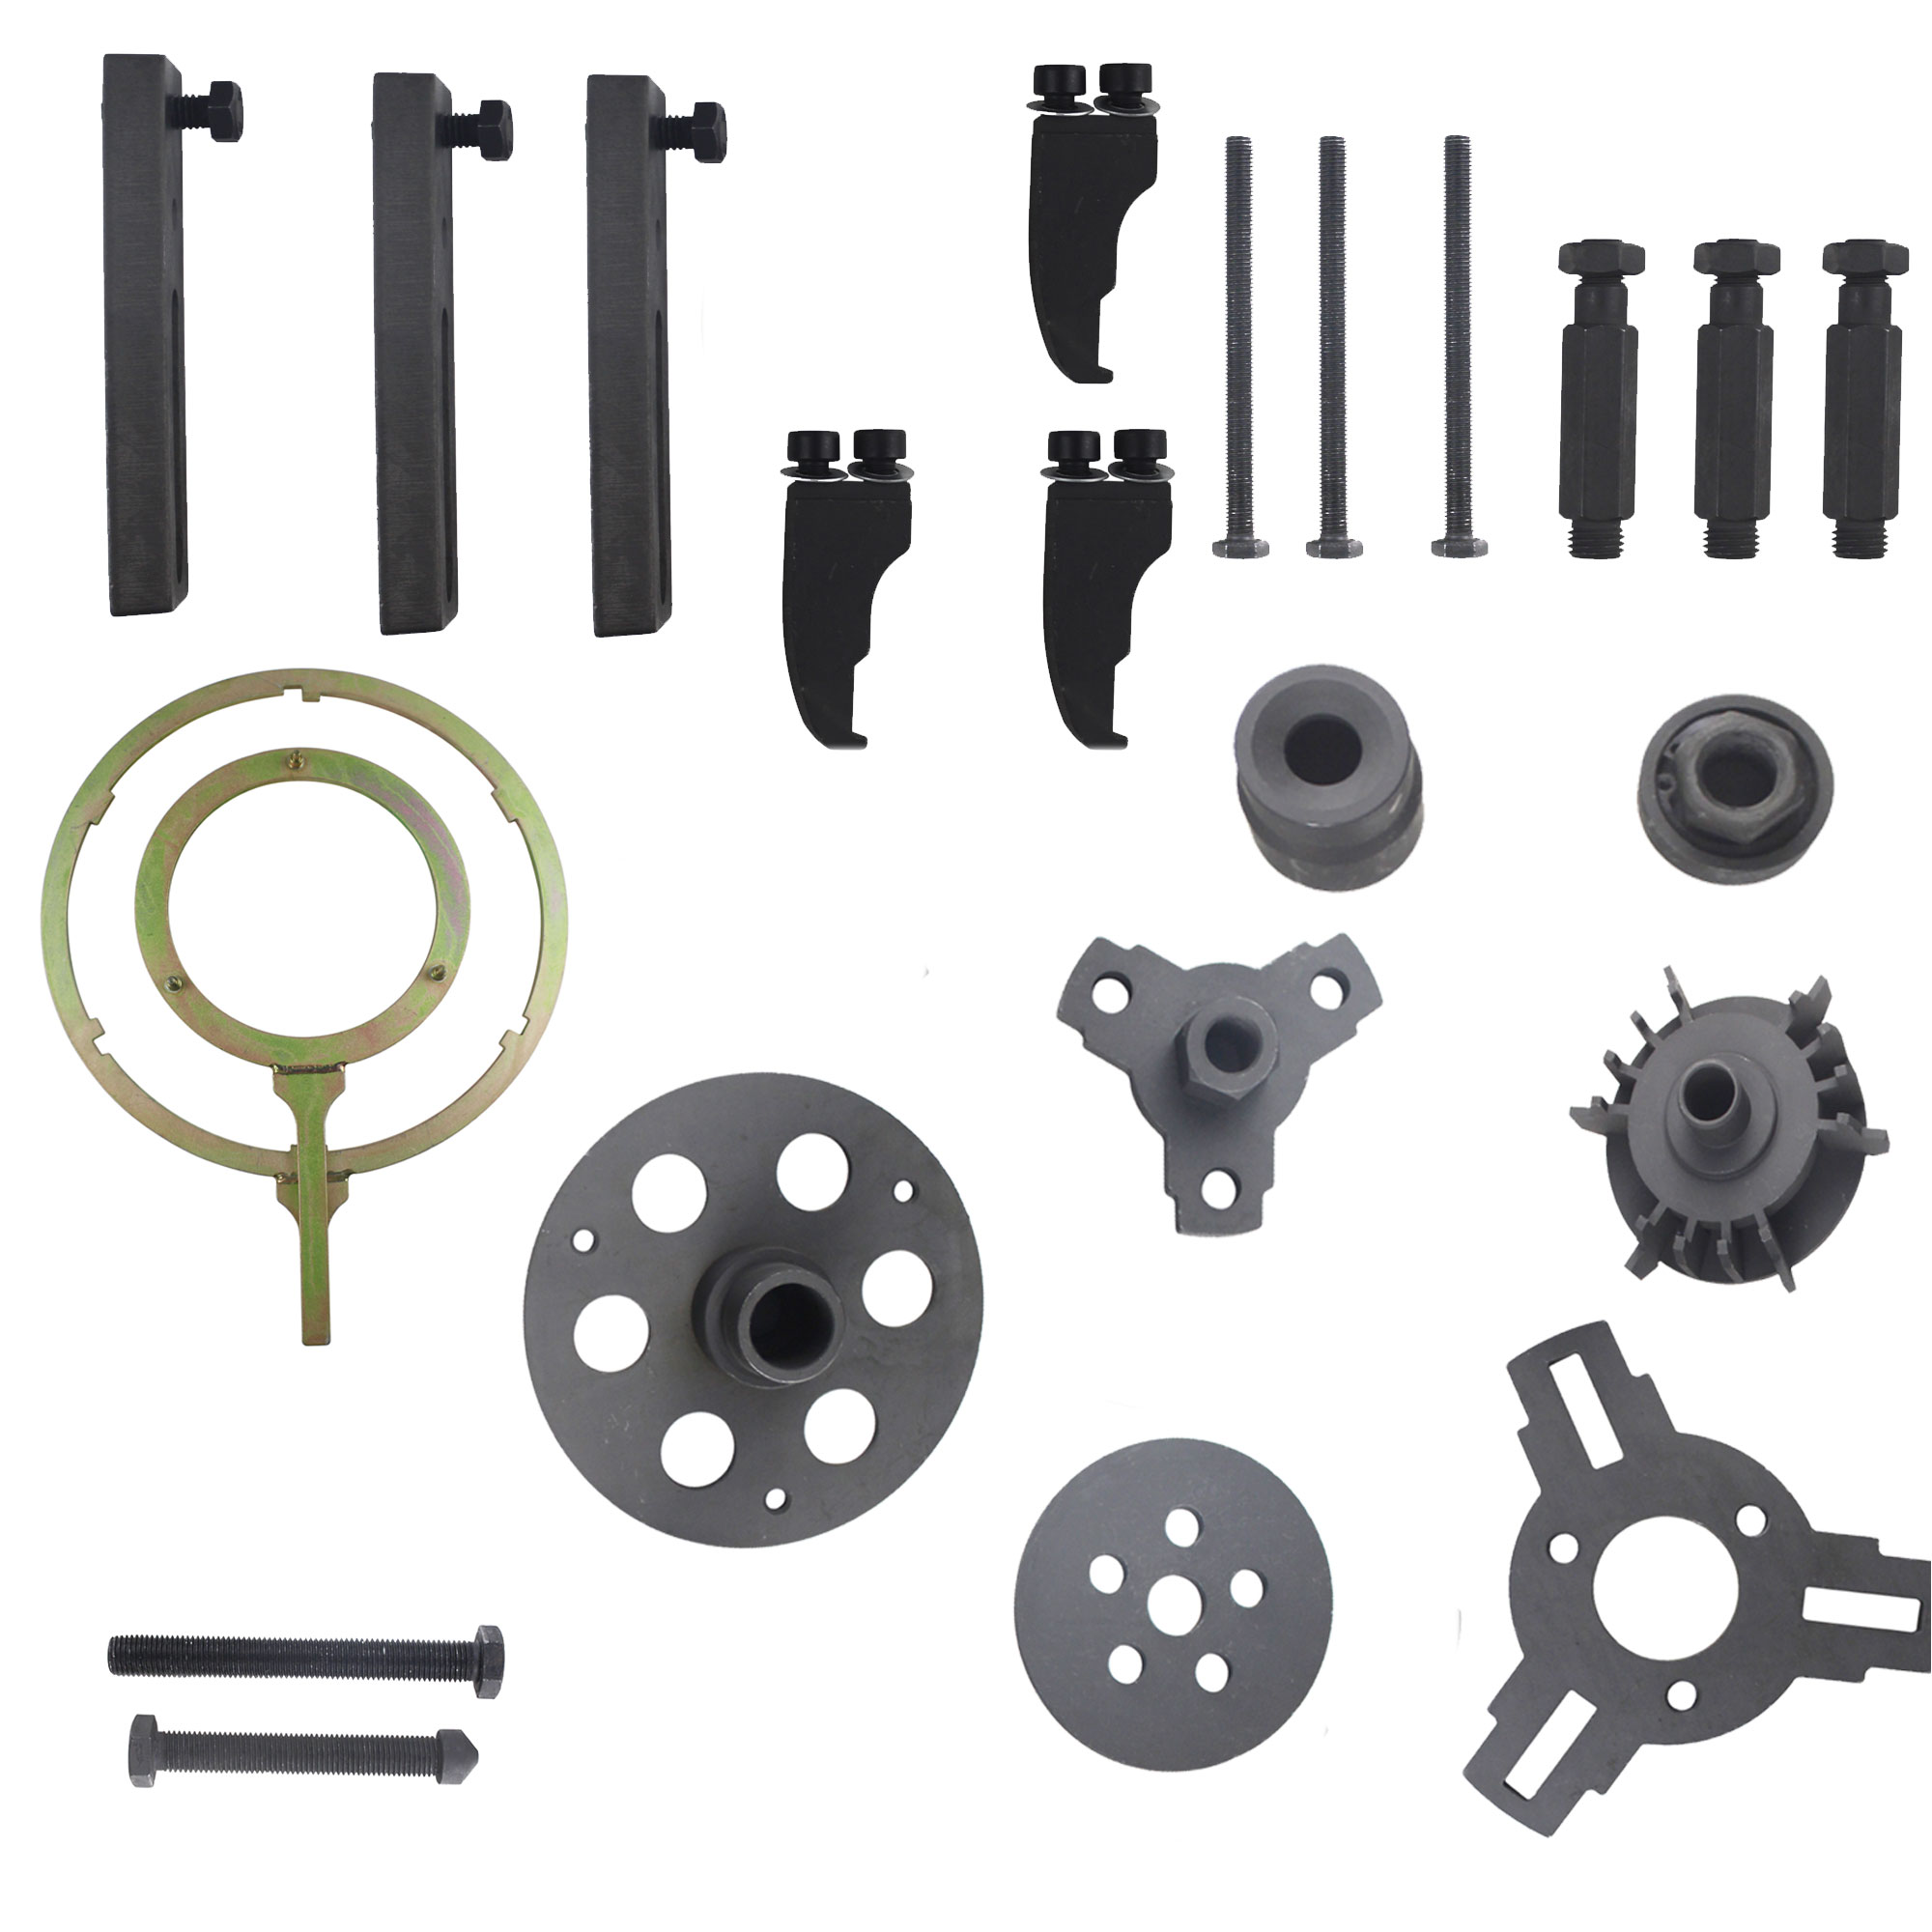 Kit de herramientas de removedor e instalador para Ford doble embrague transmisión DSG